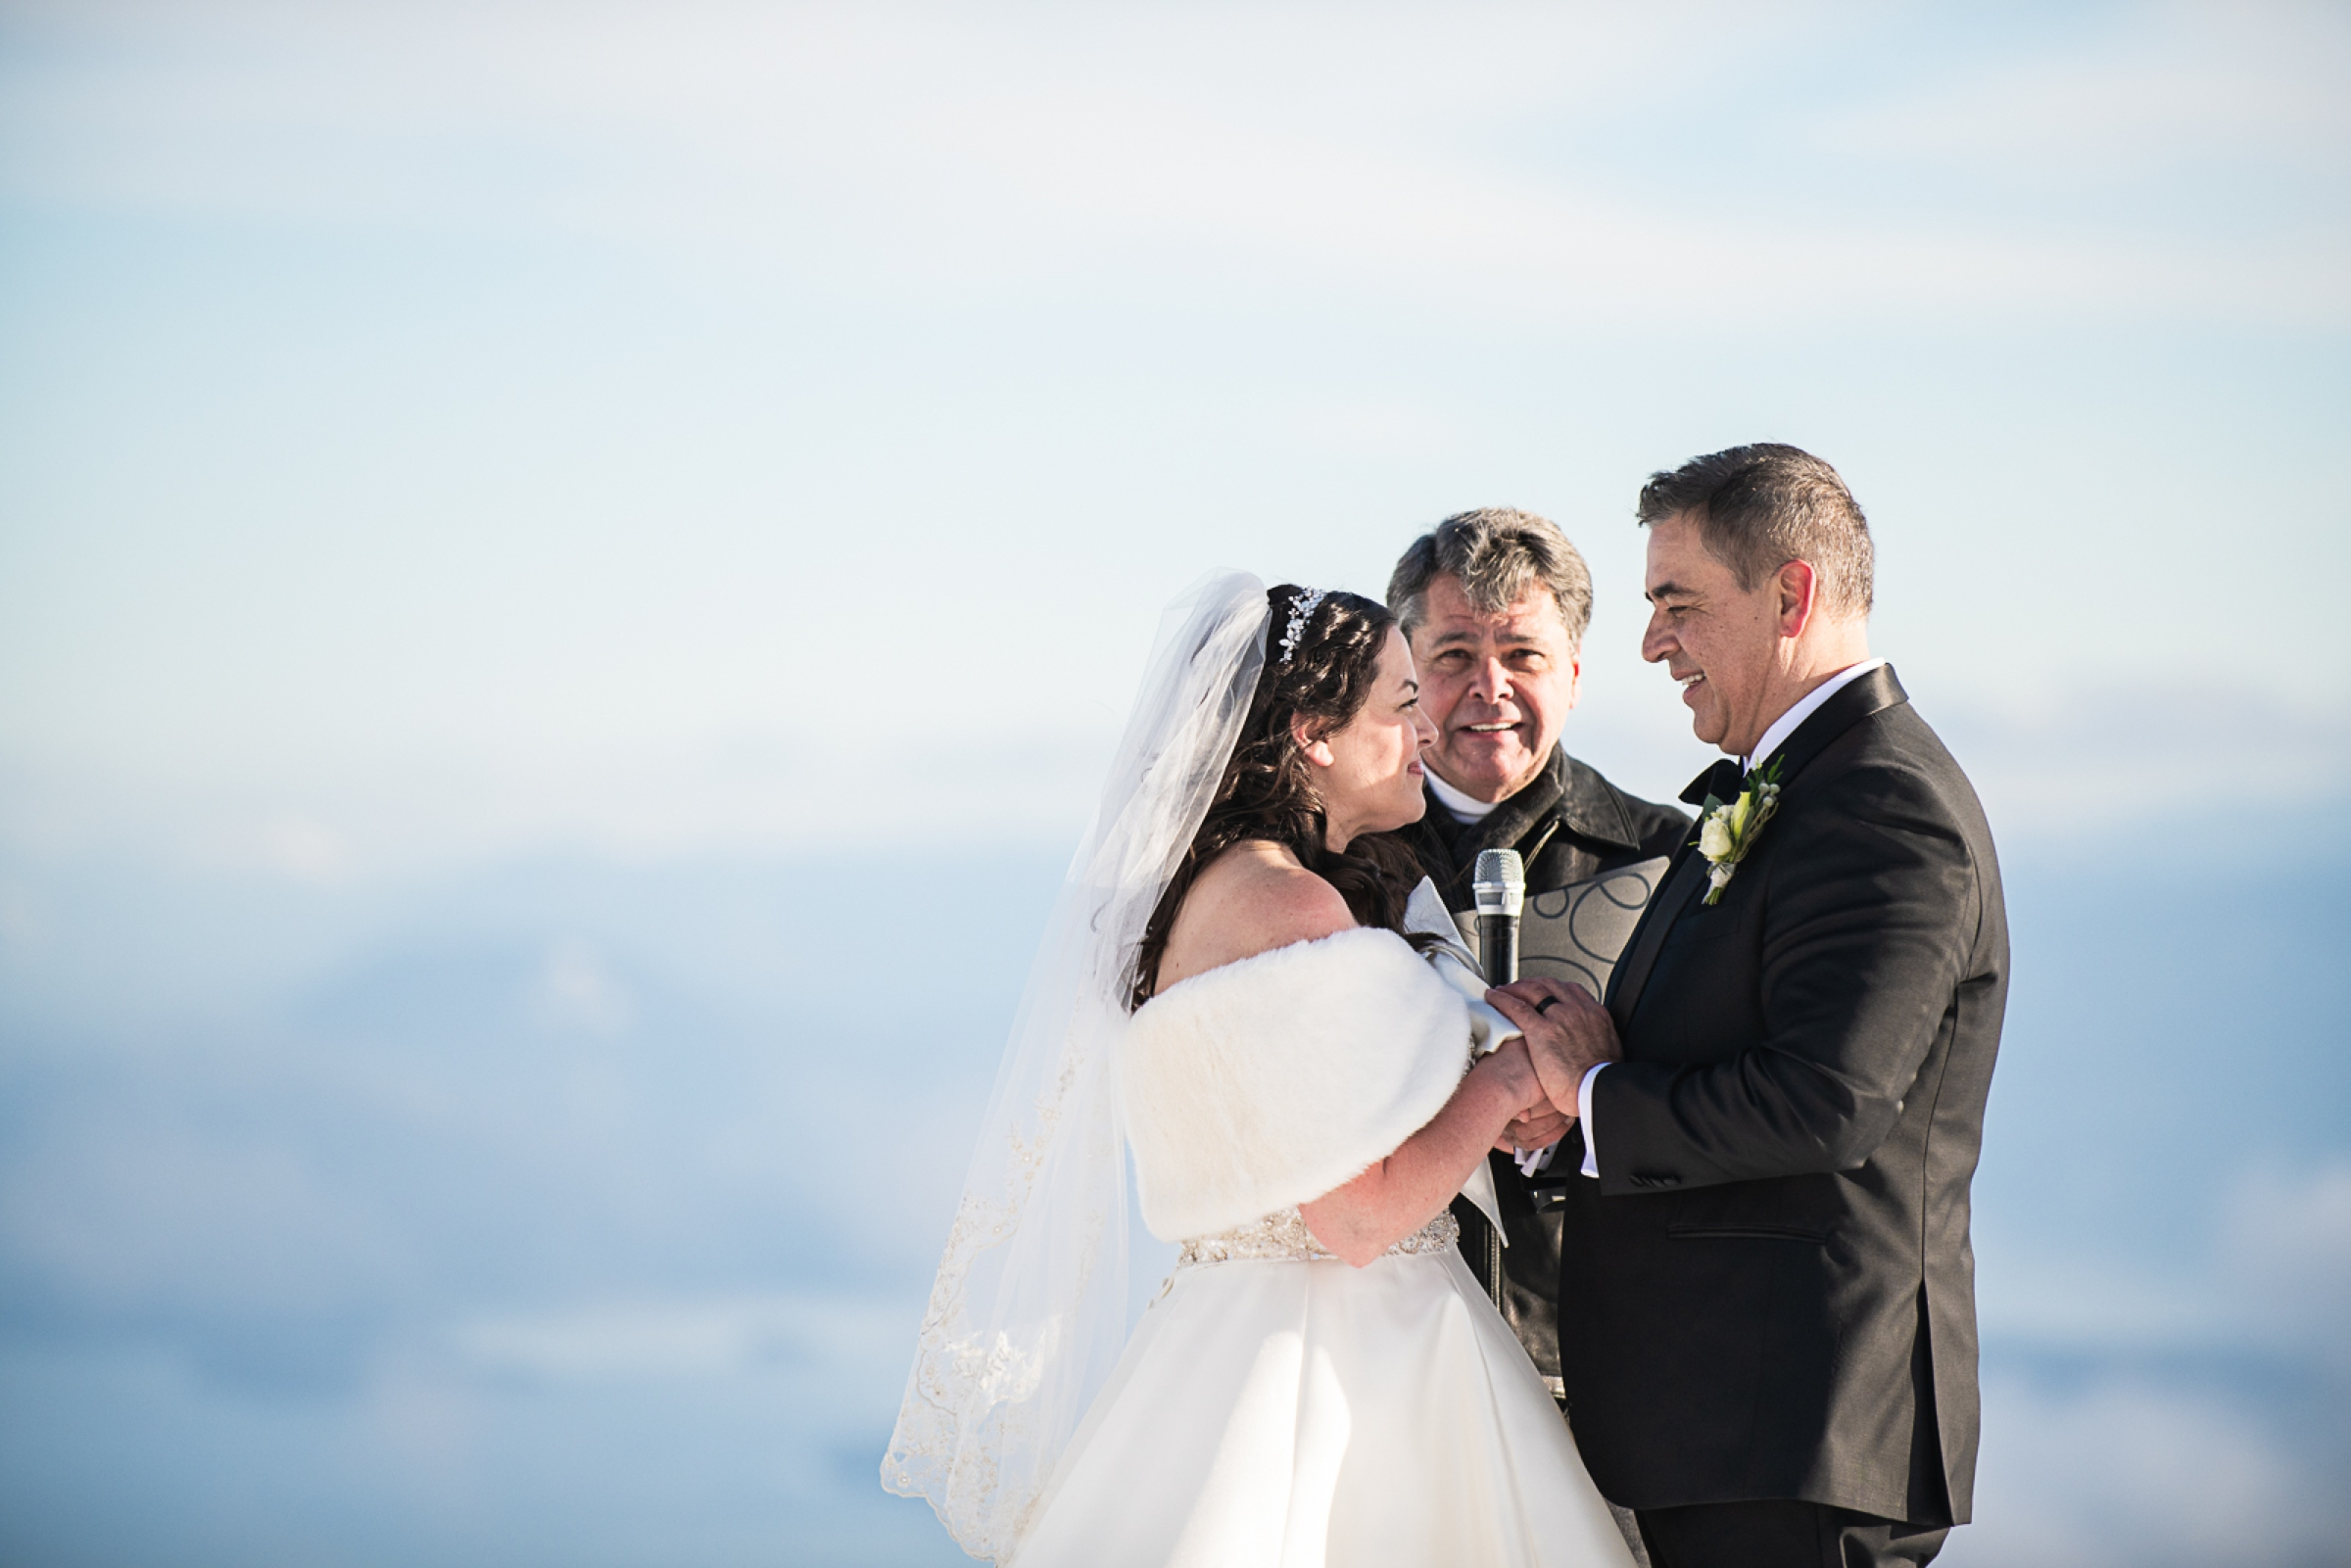 Janel-Gion-Wedding-Photographer-KristinRon-Sandpoint-Idaho.jpg_0010.jpg